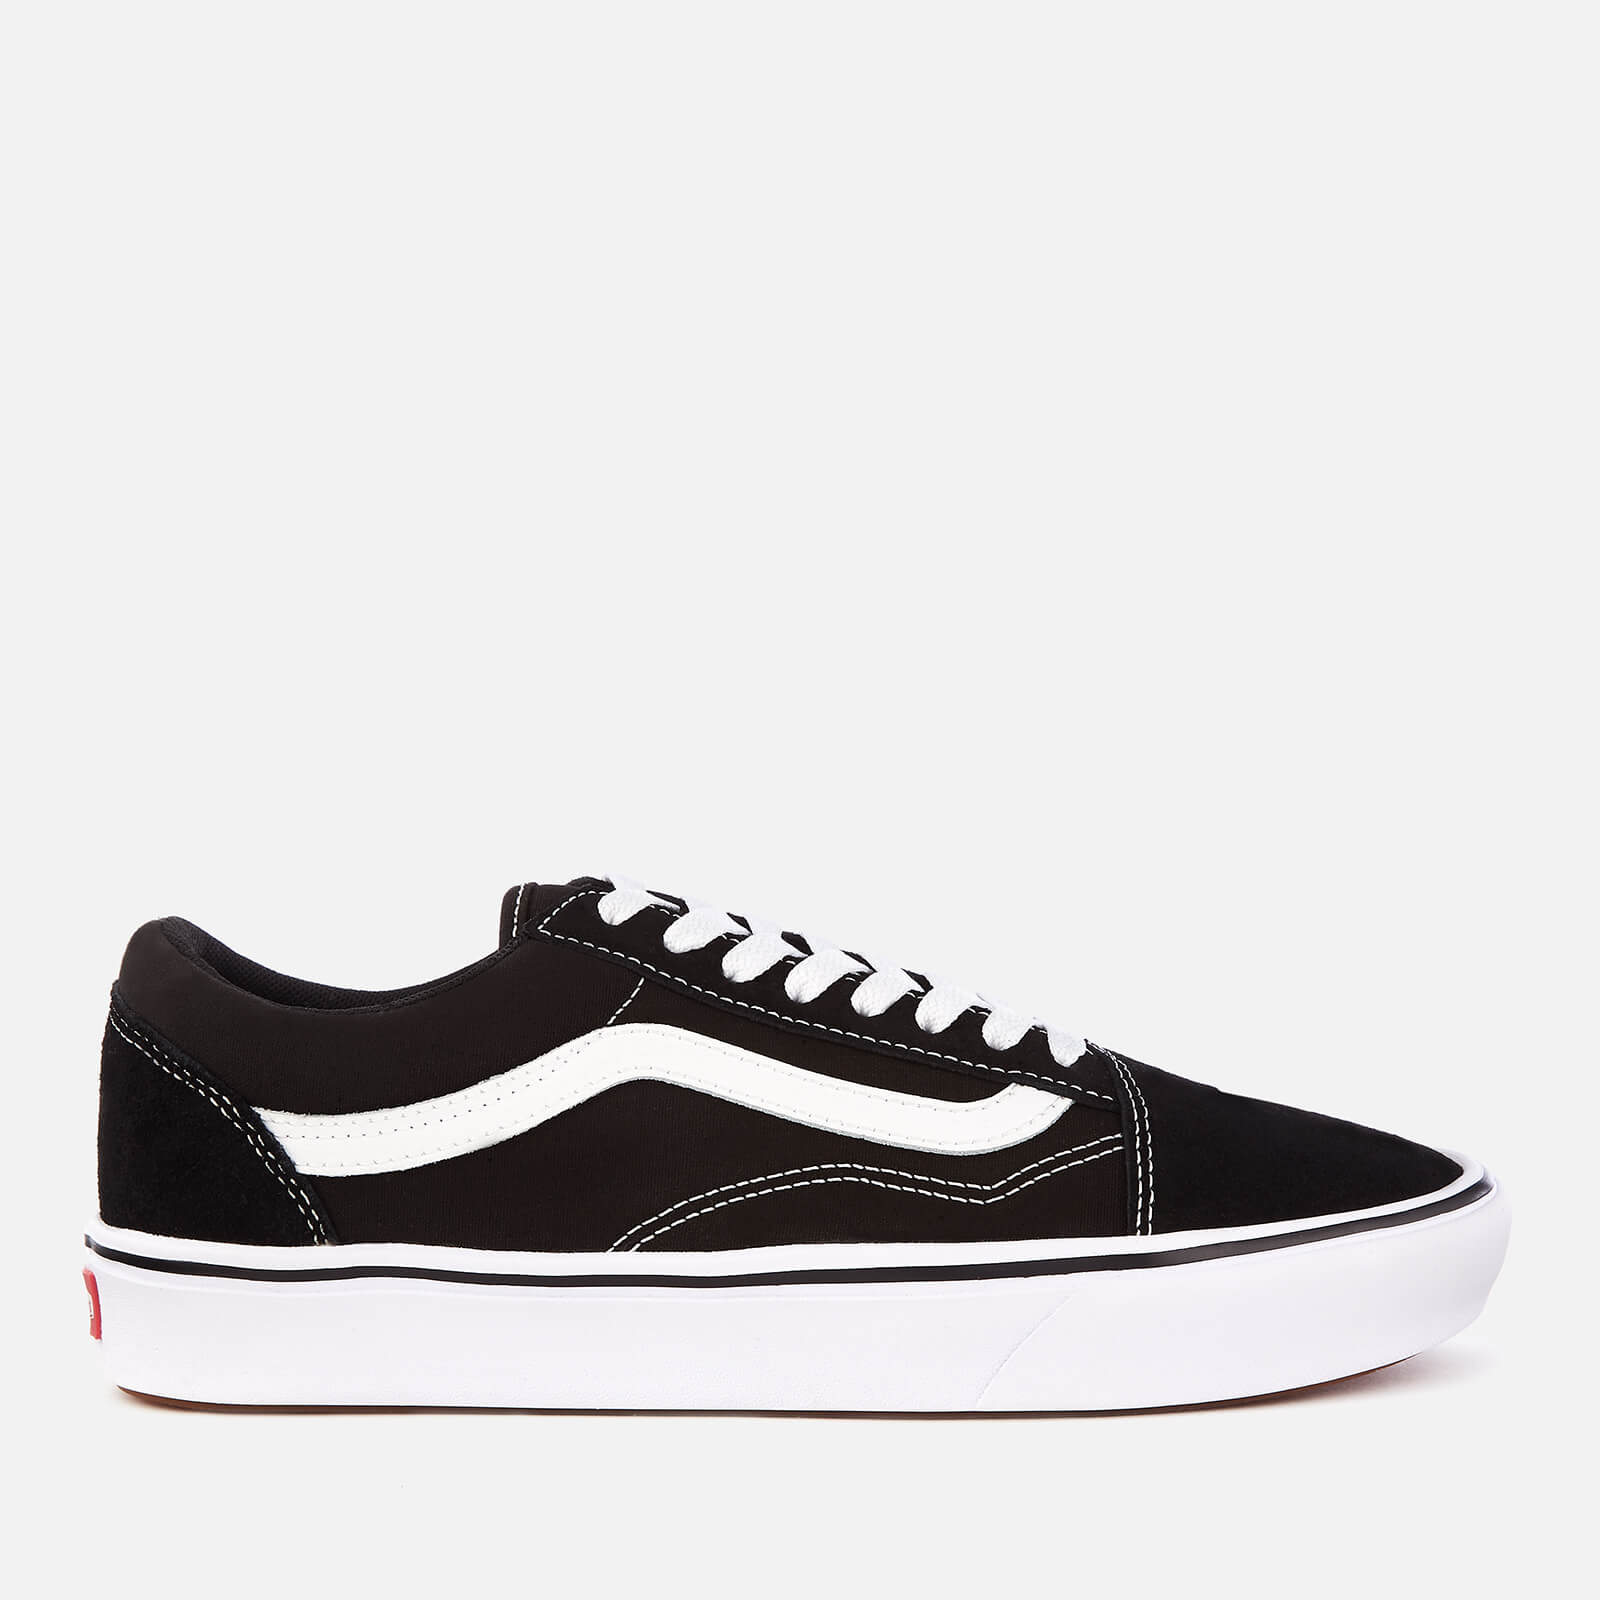 Vans ComfyCush Classic Old Skool Trainers - Black True White  c86607a27